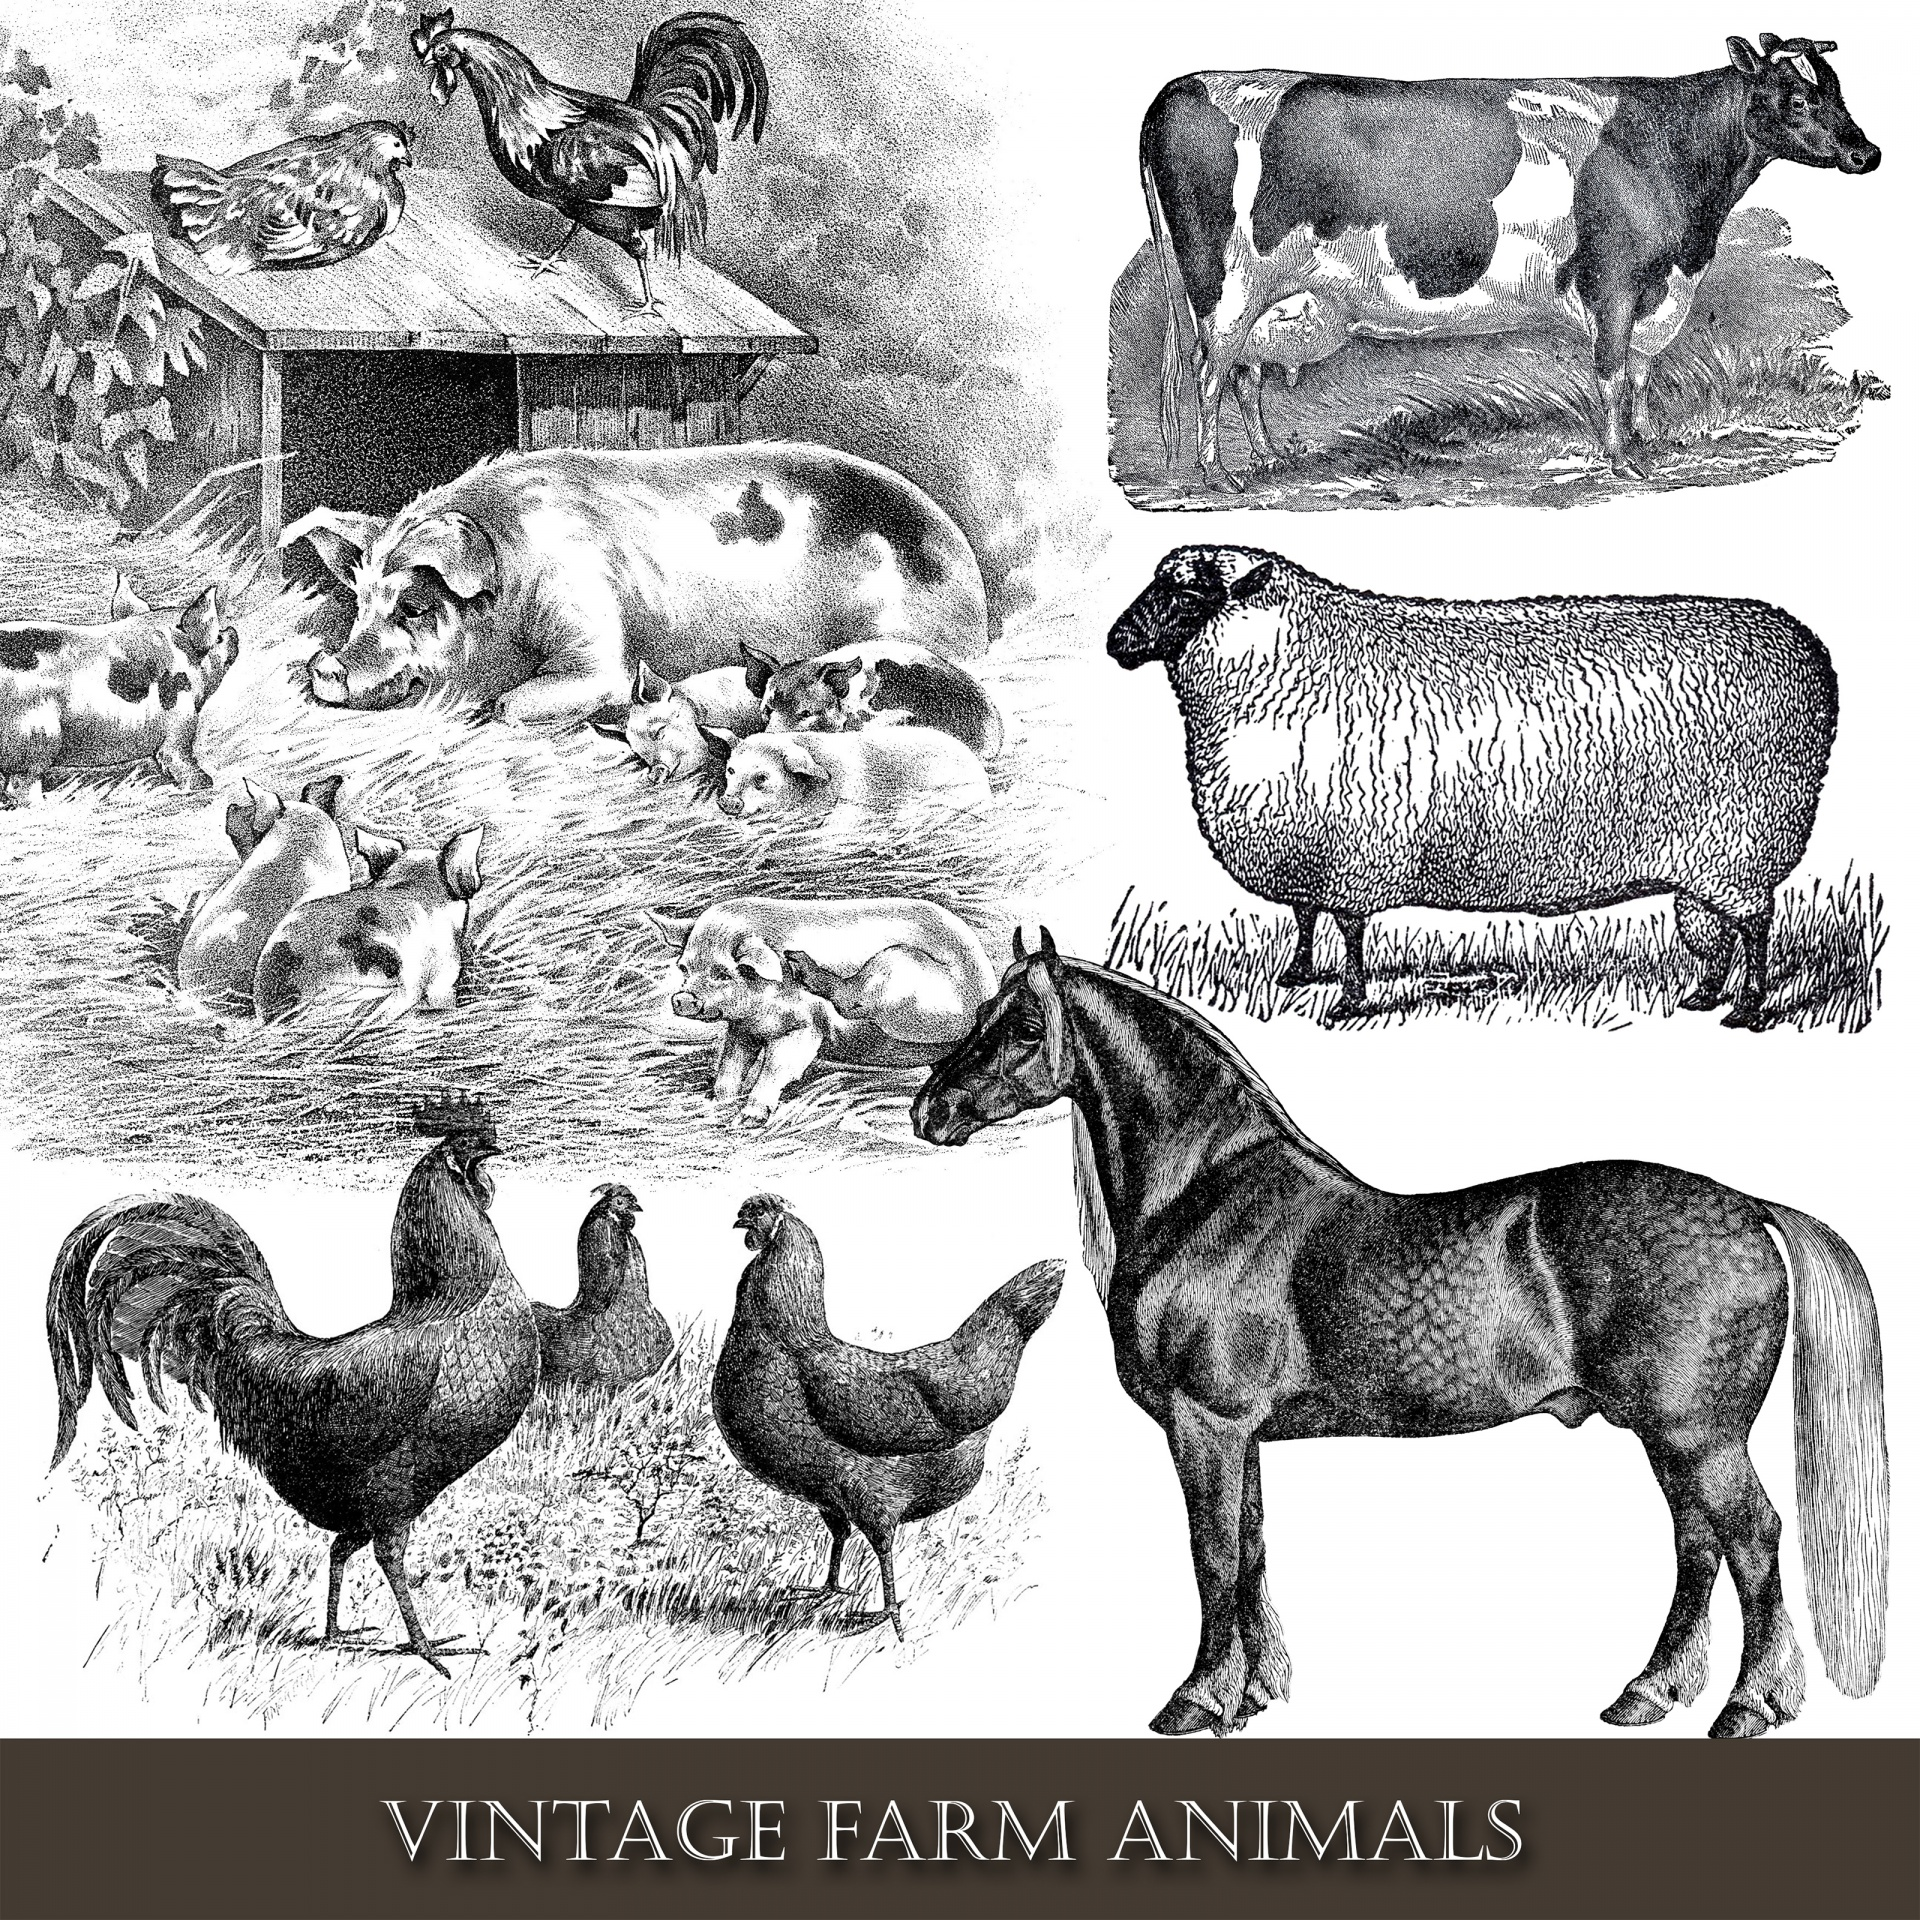 Farm Animals Vintage Clipart Free Stock Photo.